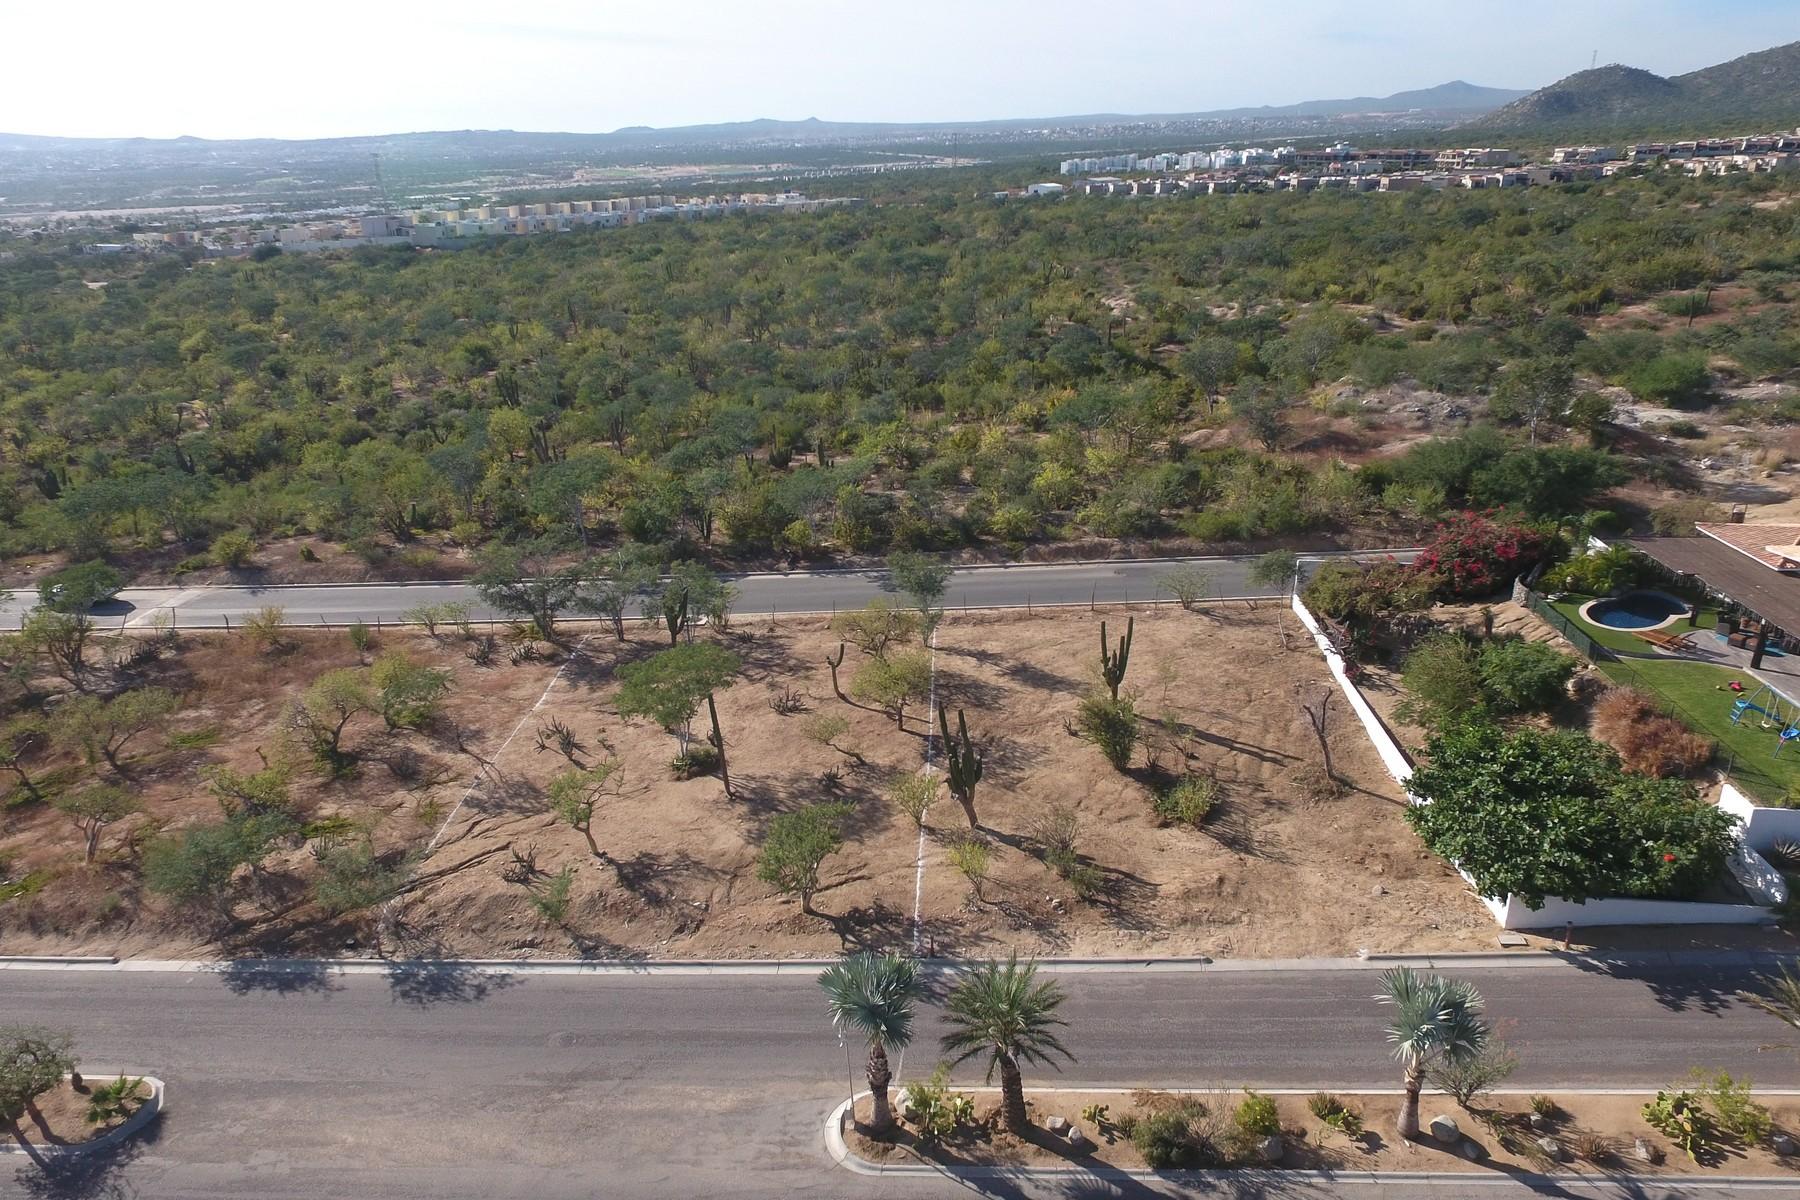 Земля для того Продажа на Lote 13F Rancho Paraiso Lote 13F Paseo San Jorge, Cabo San Lucas, Baja California Sur, 23454 Мексика